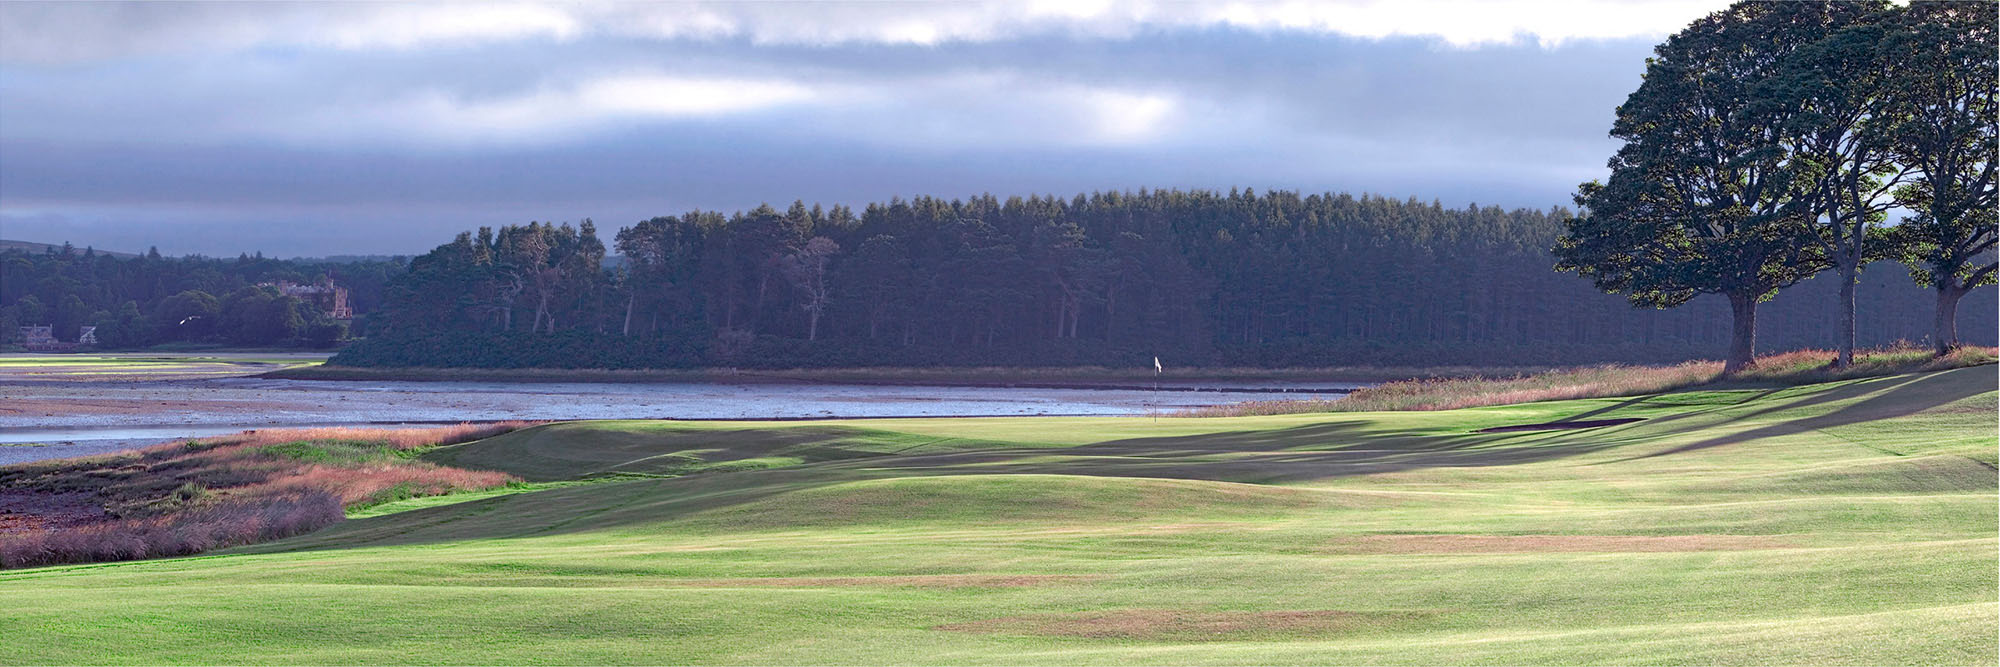 Golf Course Image - Skibo Castle No. 18